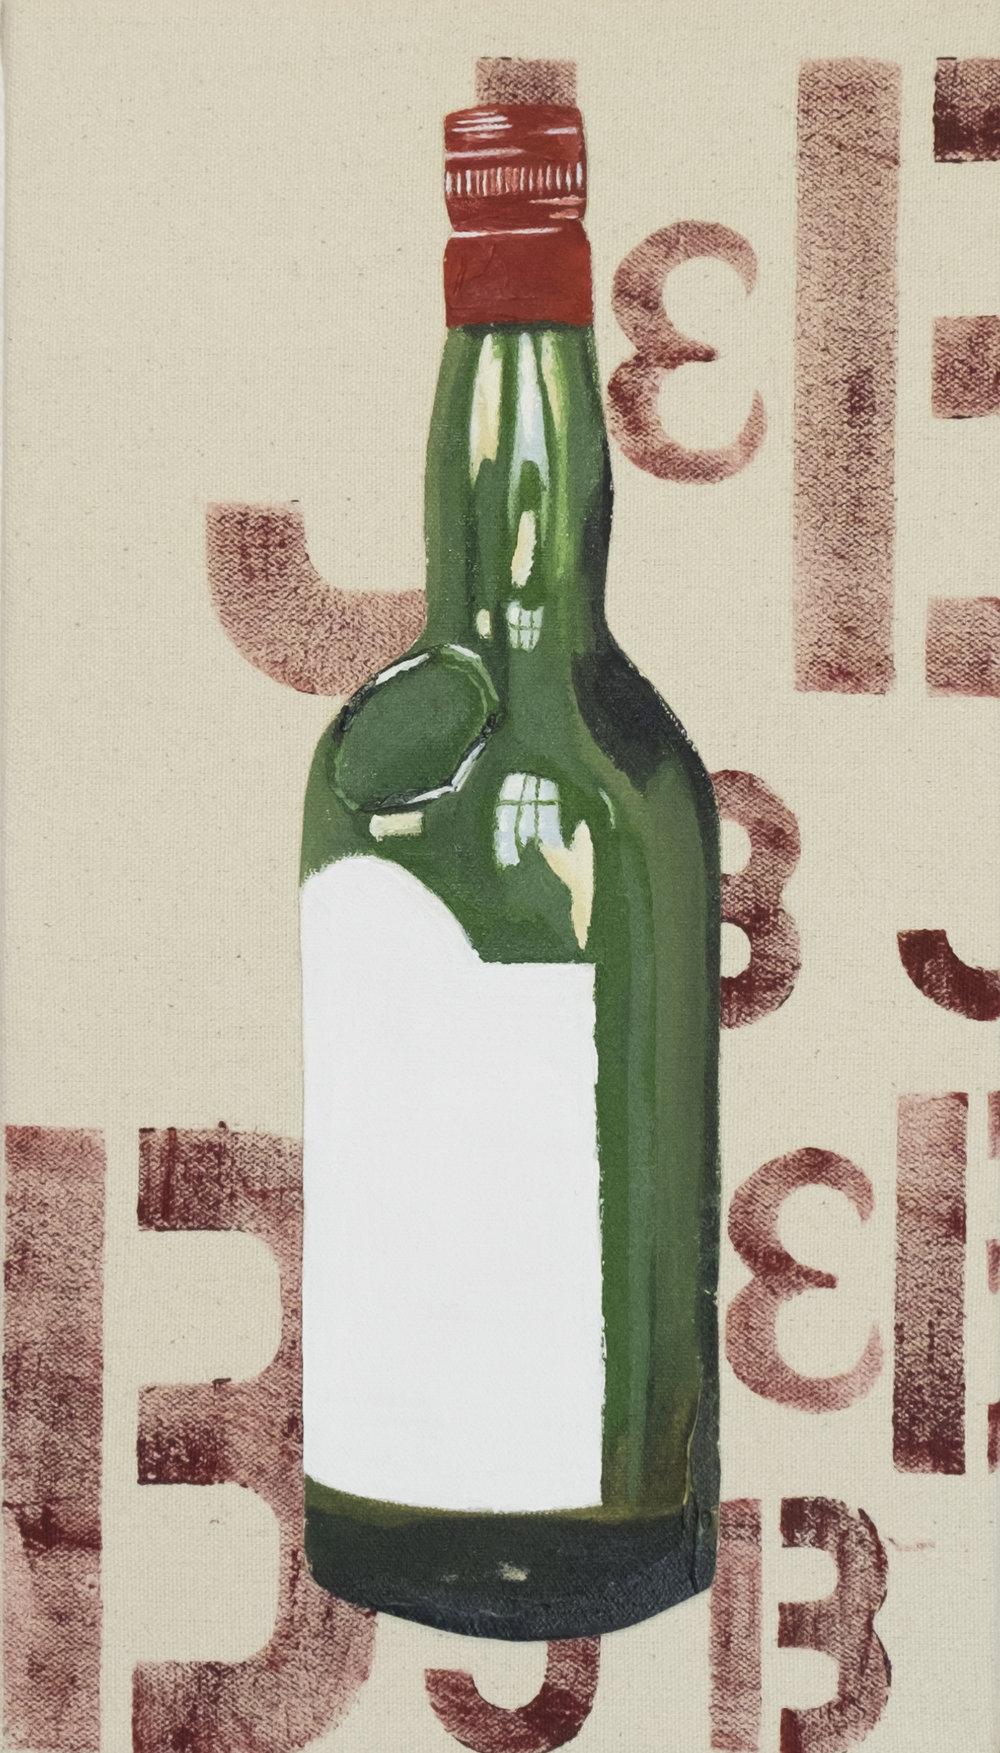 botella3.jpg